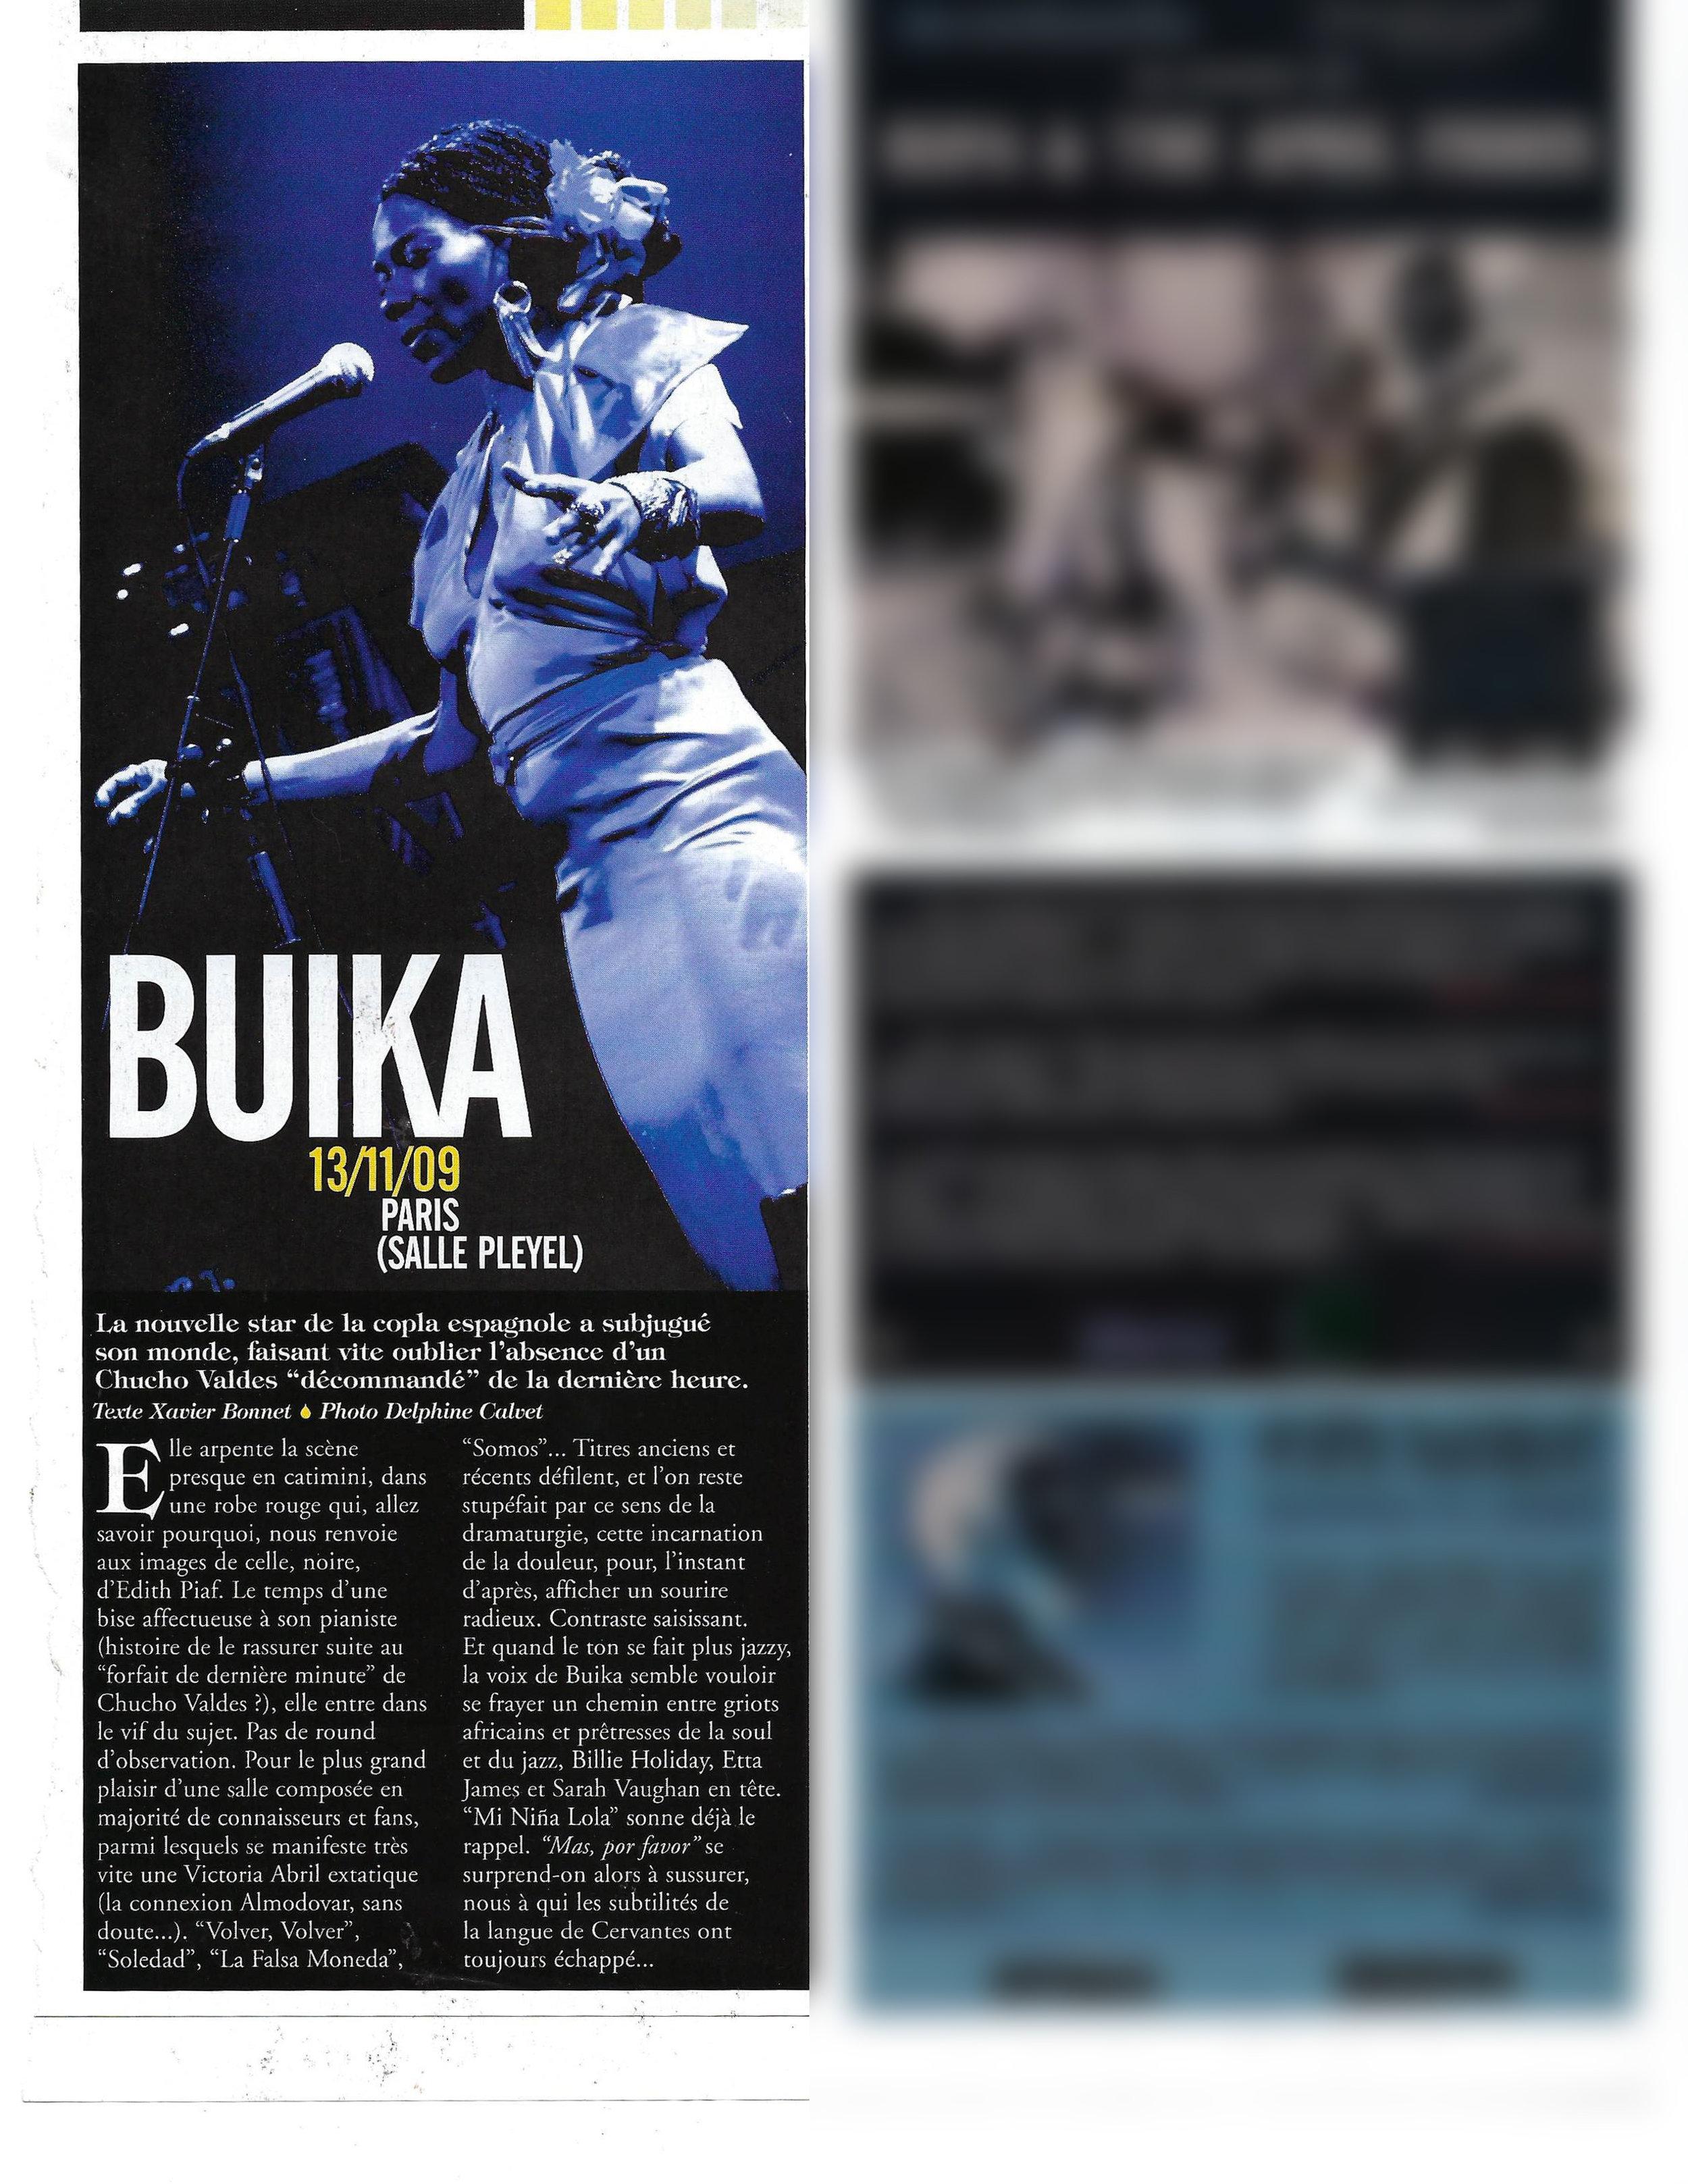 Buika (World Sound)